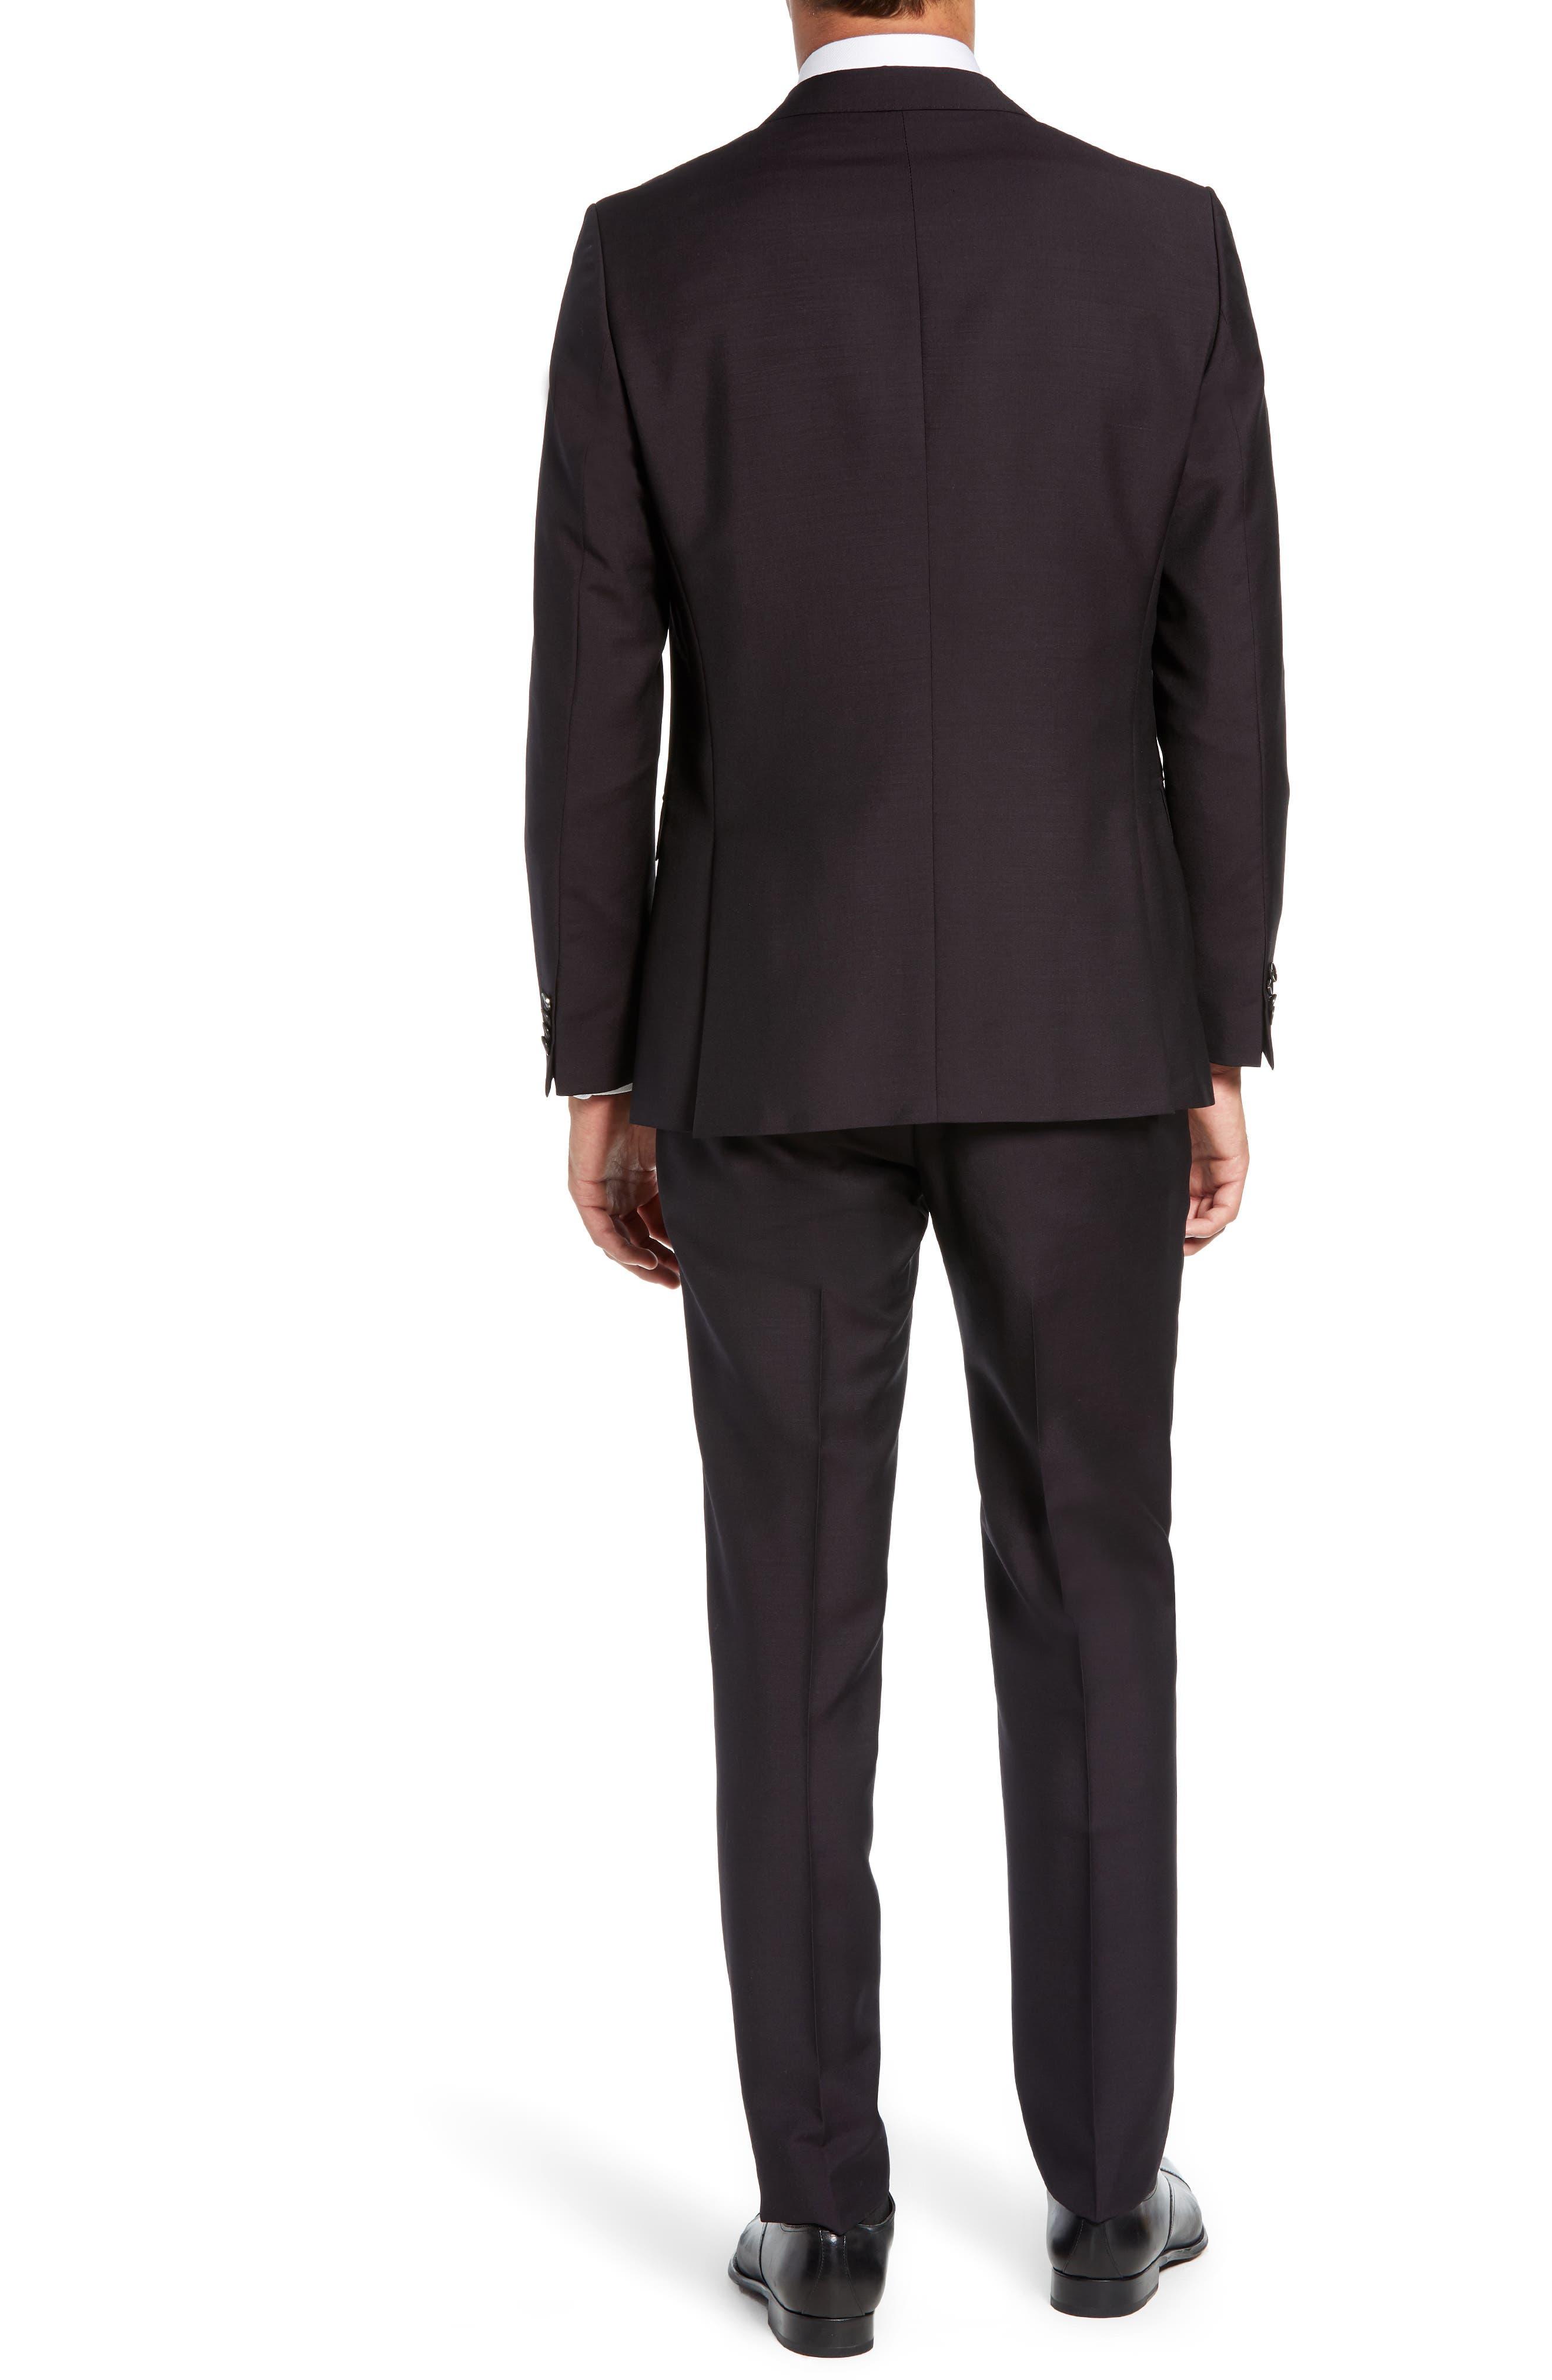 Novan/Ben Trim Fit Solid Wool & Mohair Suit,                             Alternate thumbnail 2, color,                             DARK PURPLE